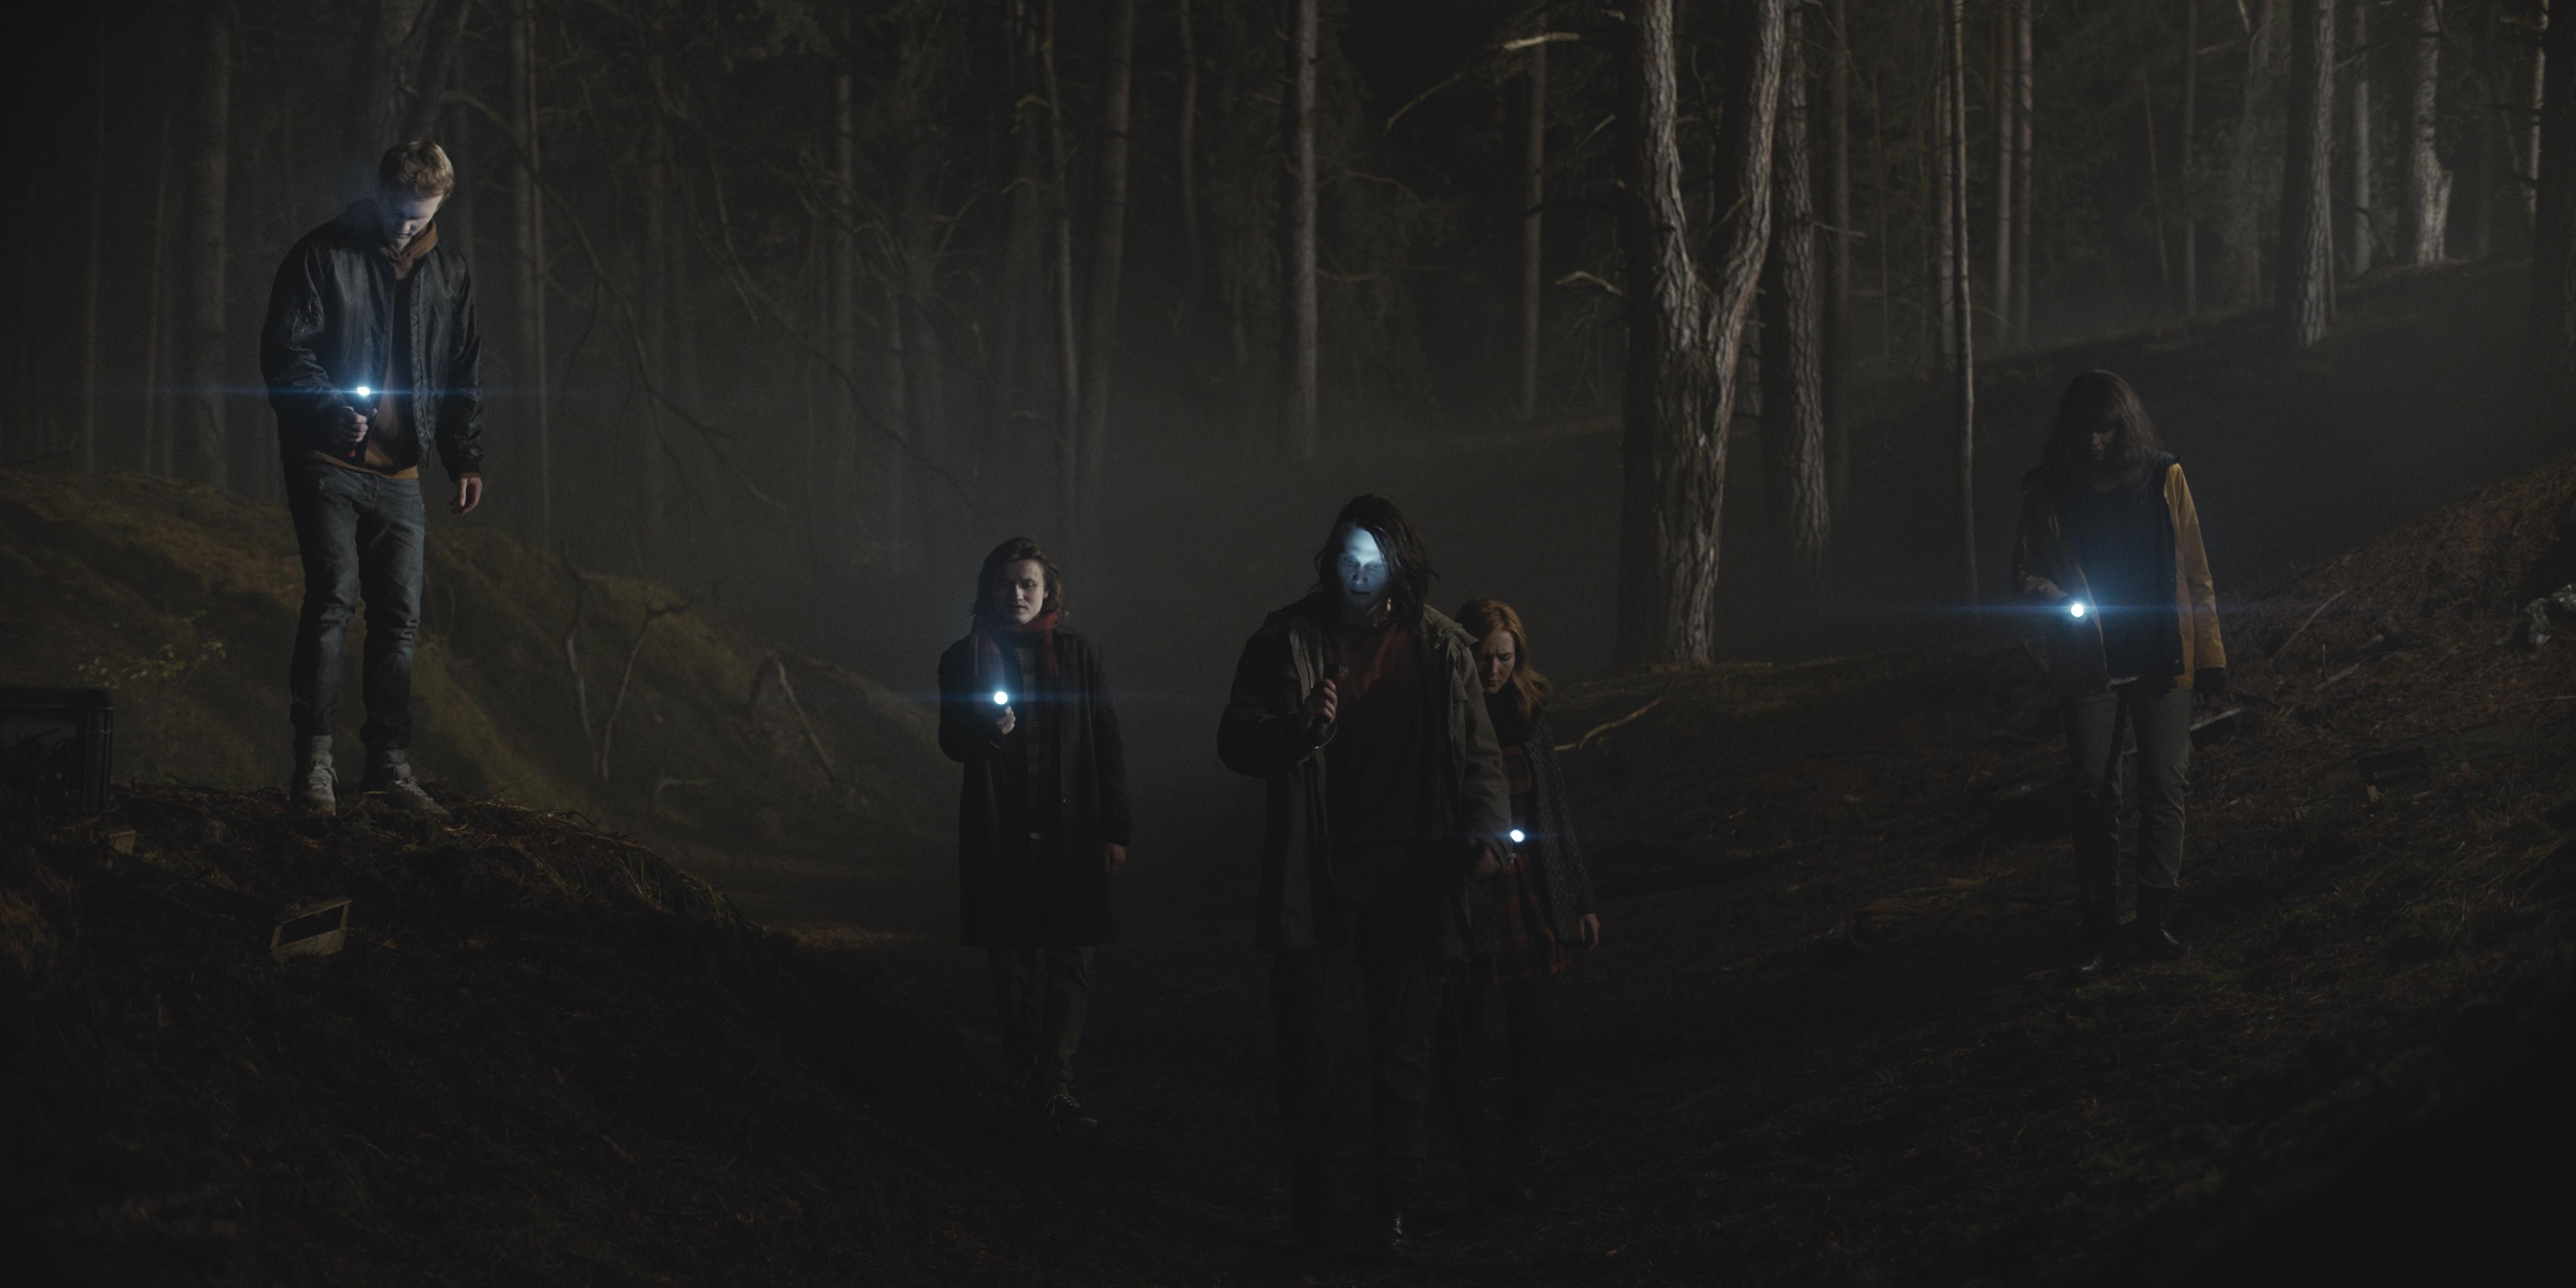 Dark Netflix Season 3 Cave Group